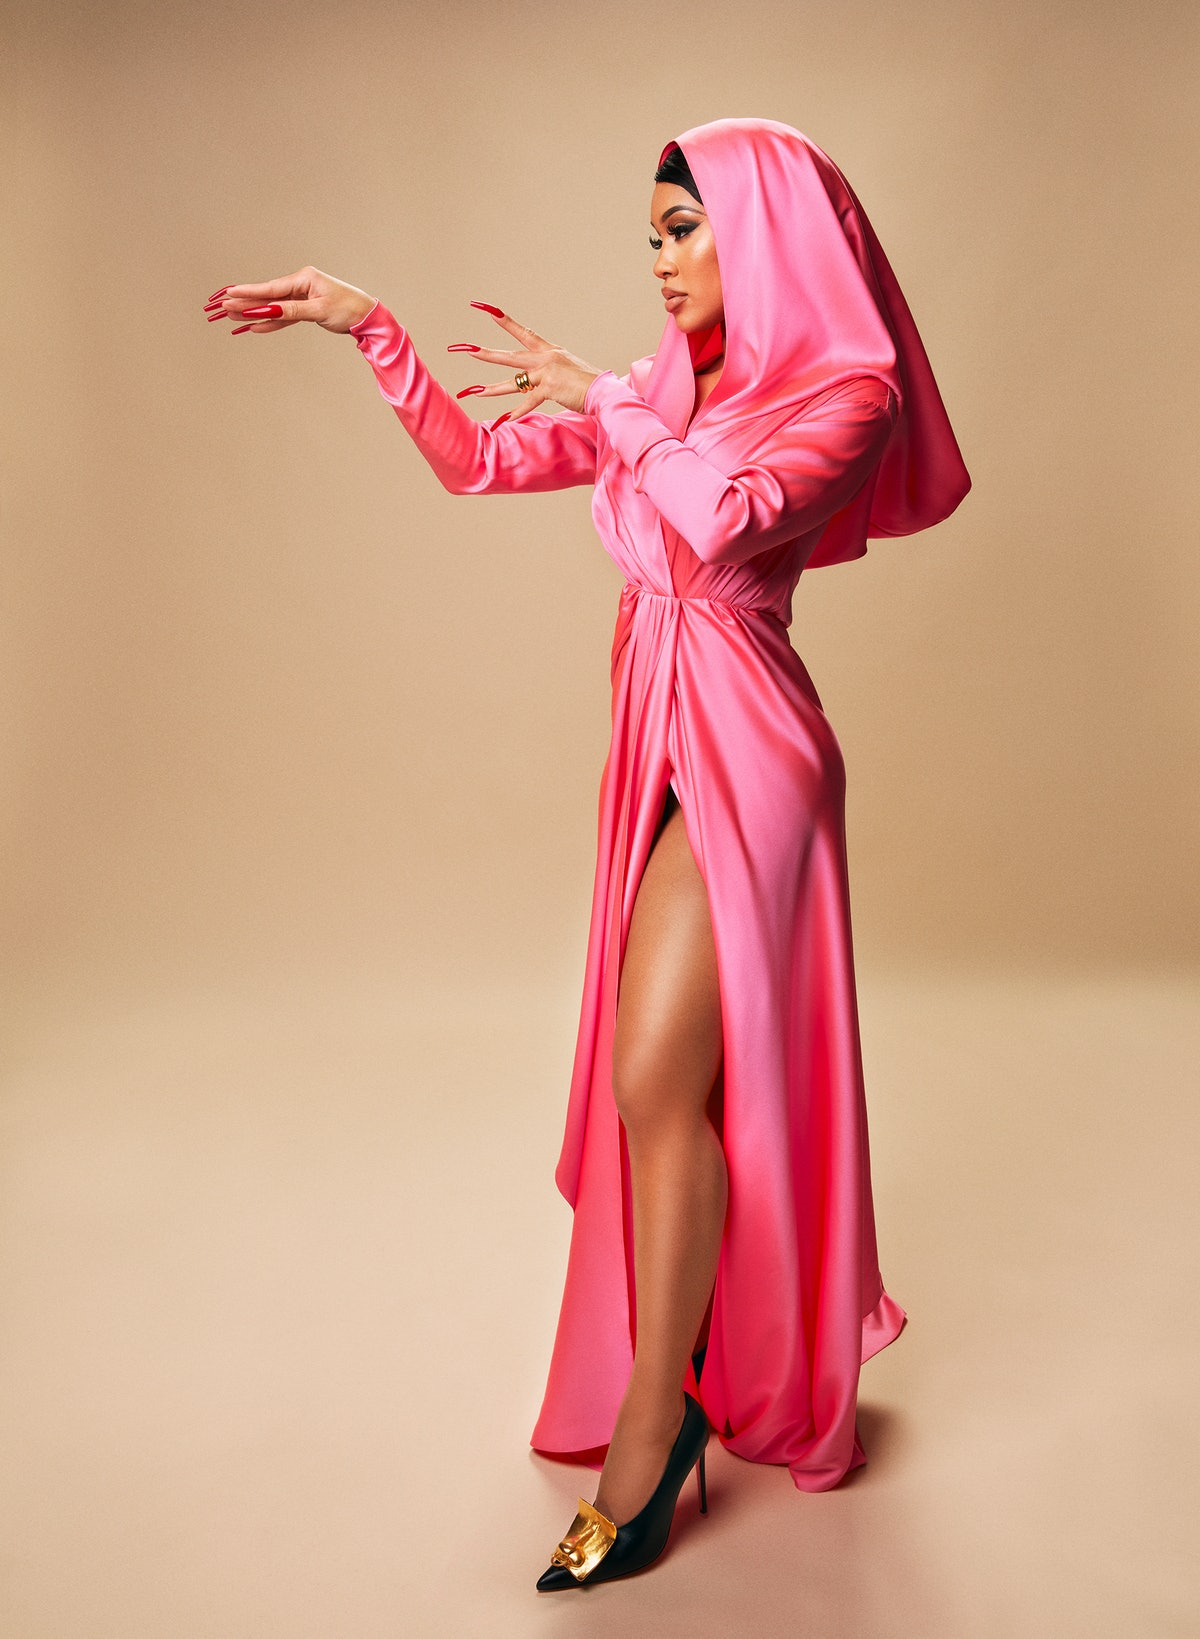 Saweetie in pink Schiaparelli dress.